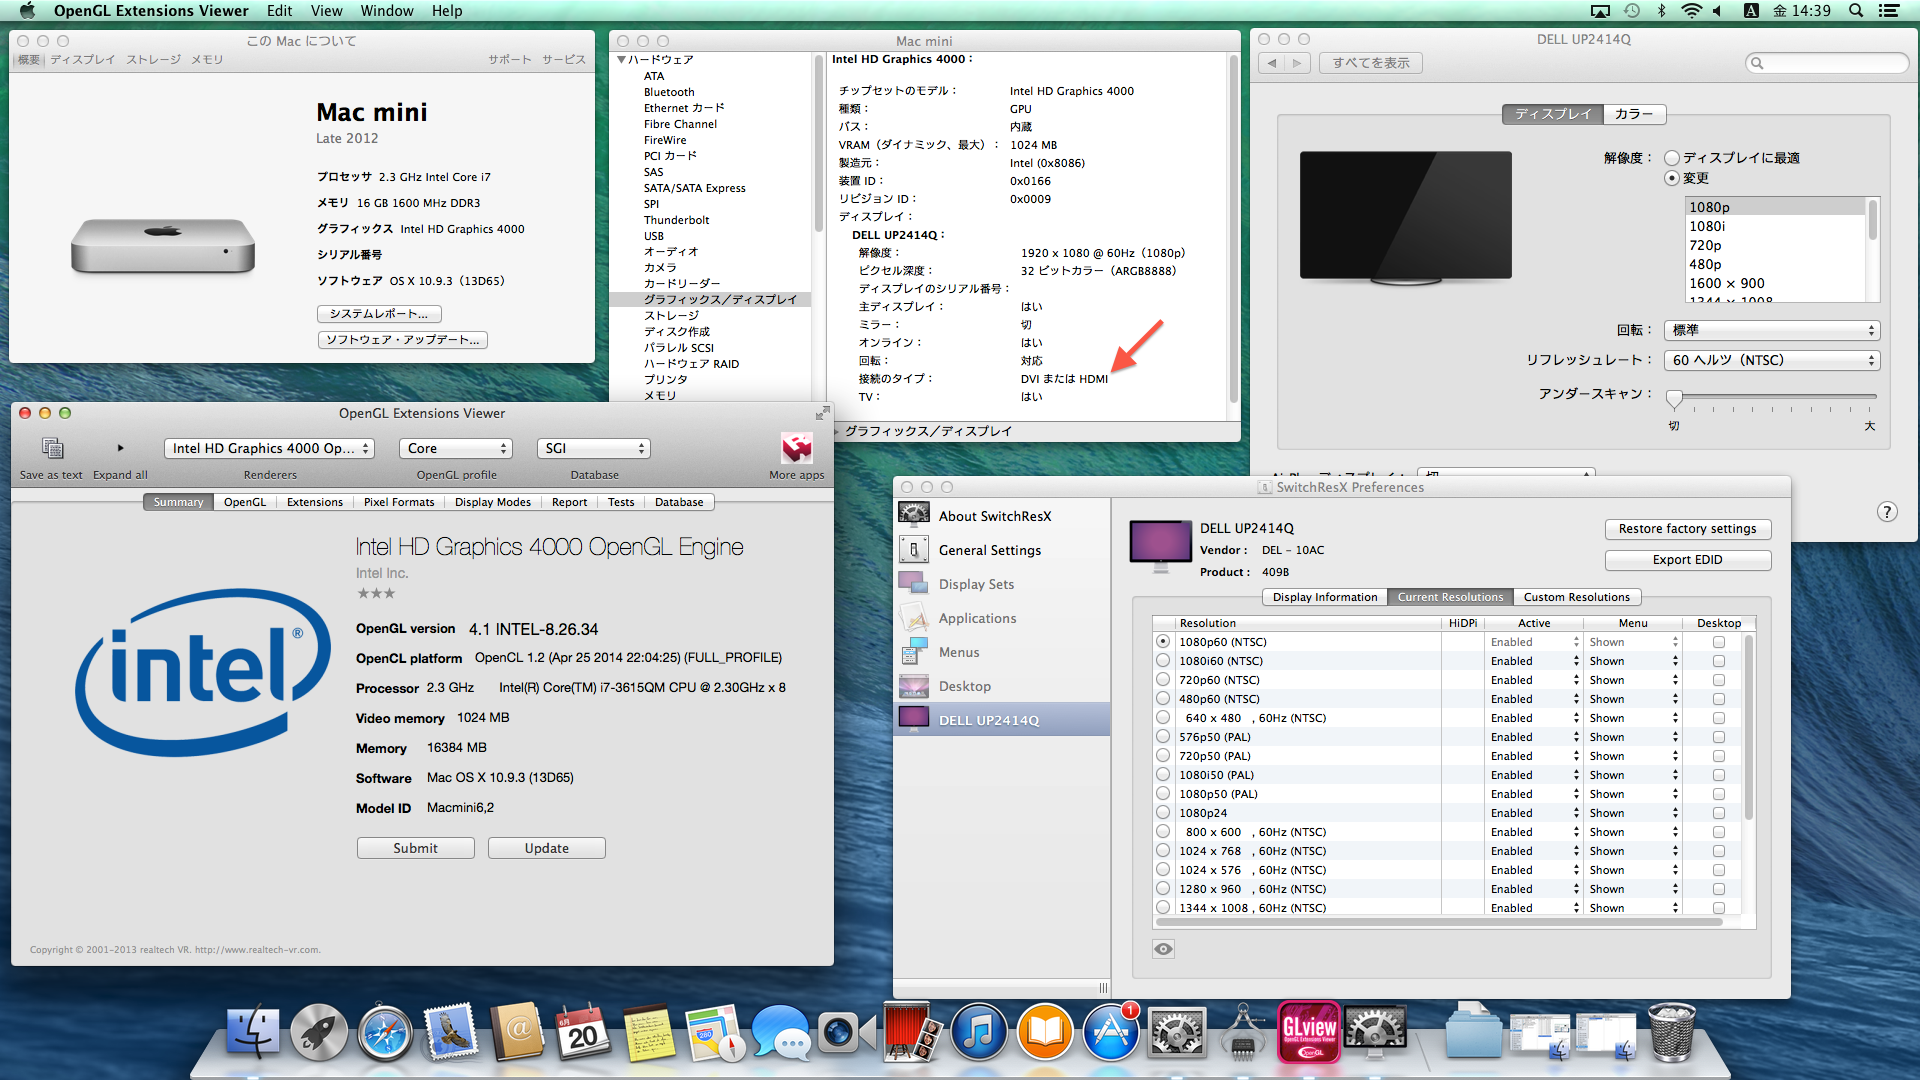 HiDPIも可能?Dellの4Kディスプレイ「UP2414Q」がMac mini Mid